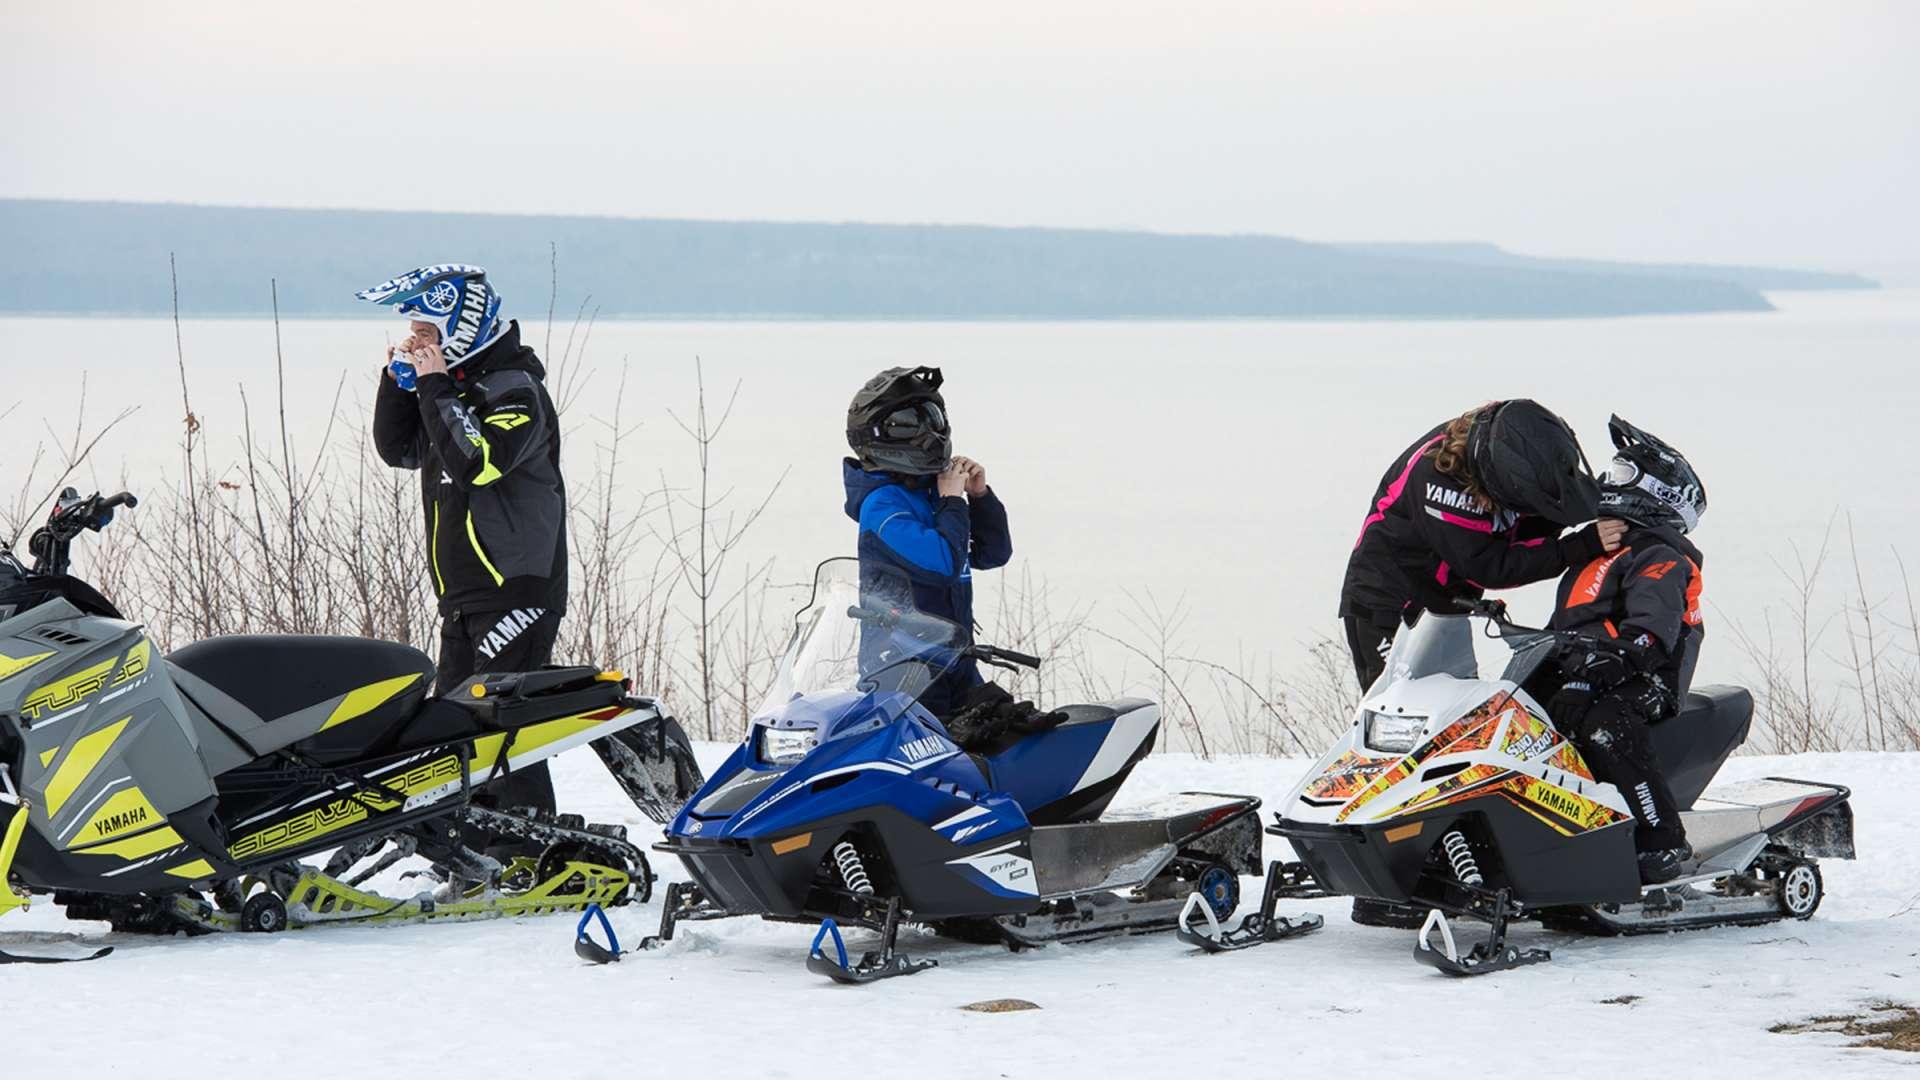 Snowmobiling at Deerhurst